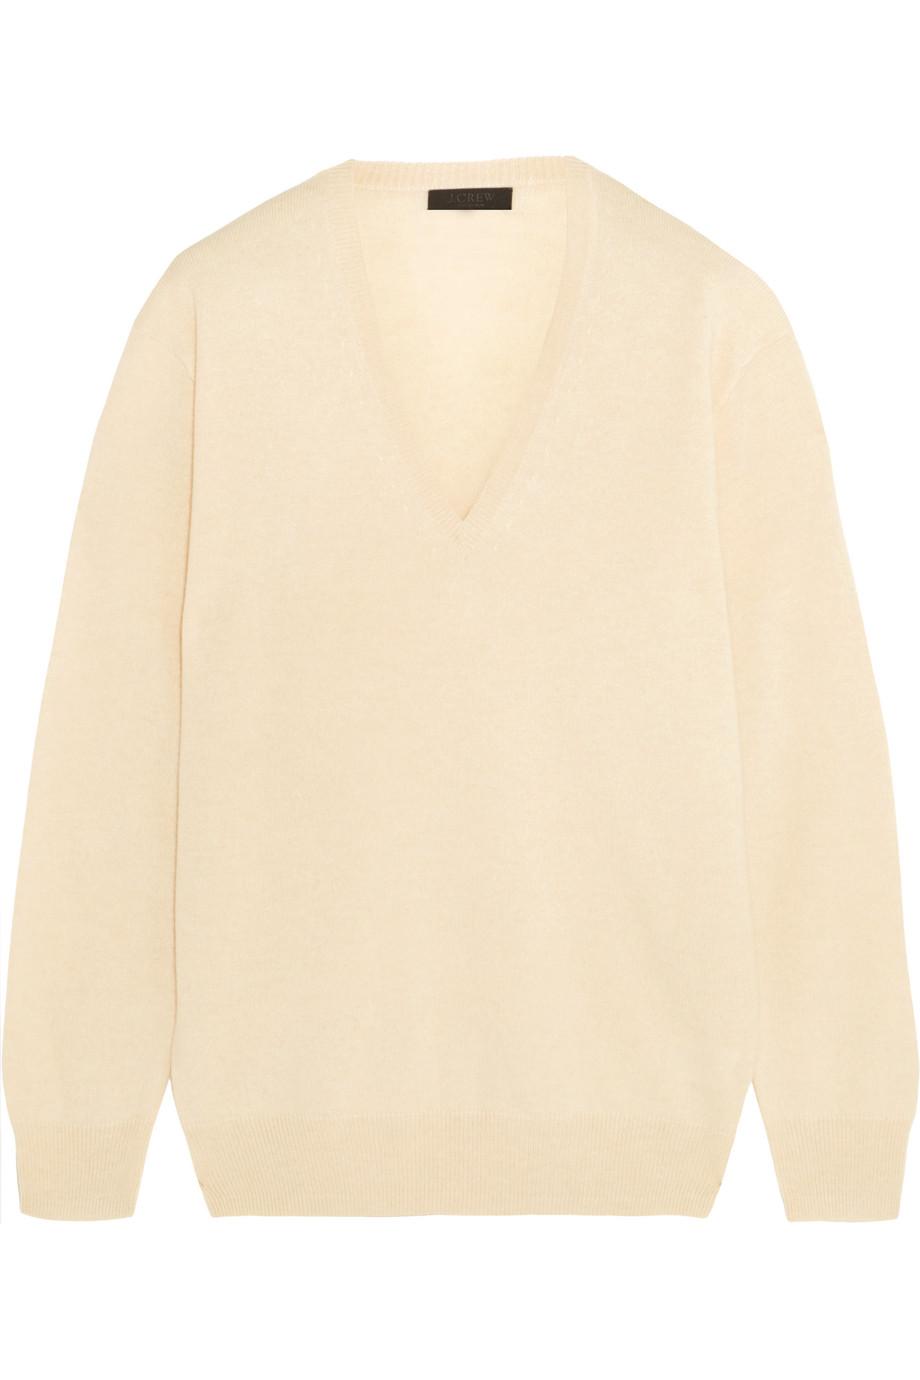 J.Crew Cashmere Sweater, Beige, Women's, Size: L